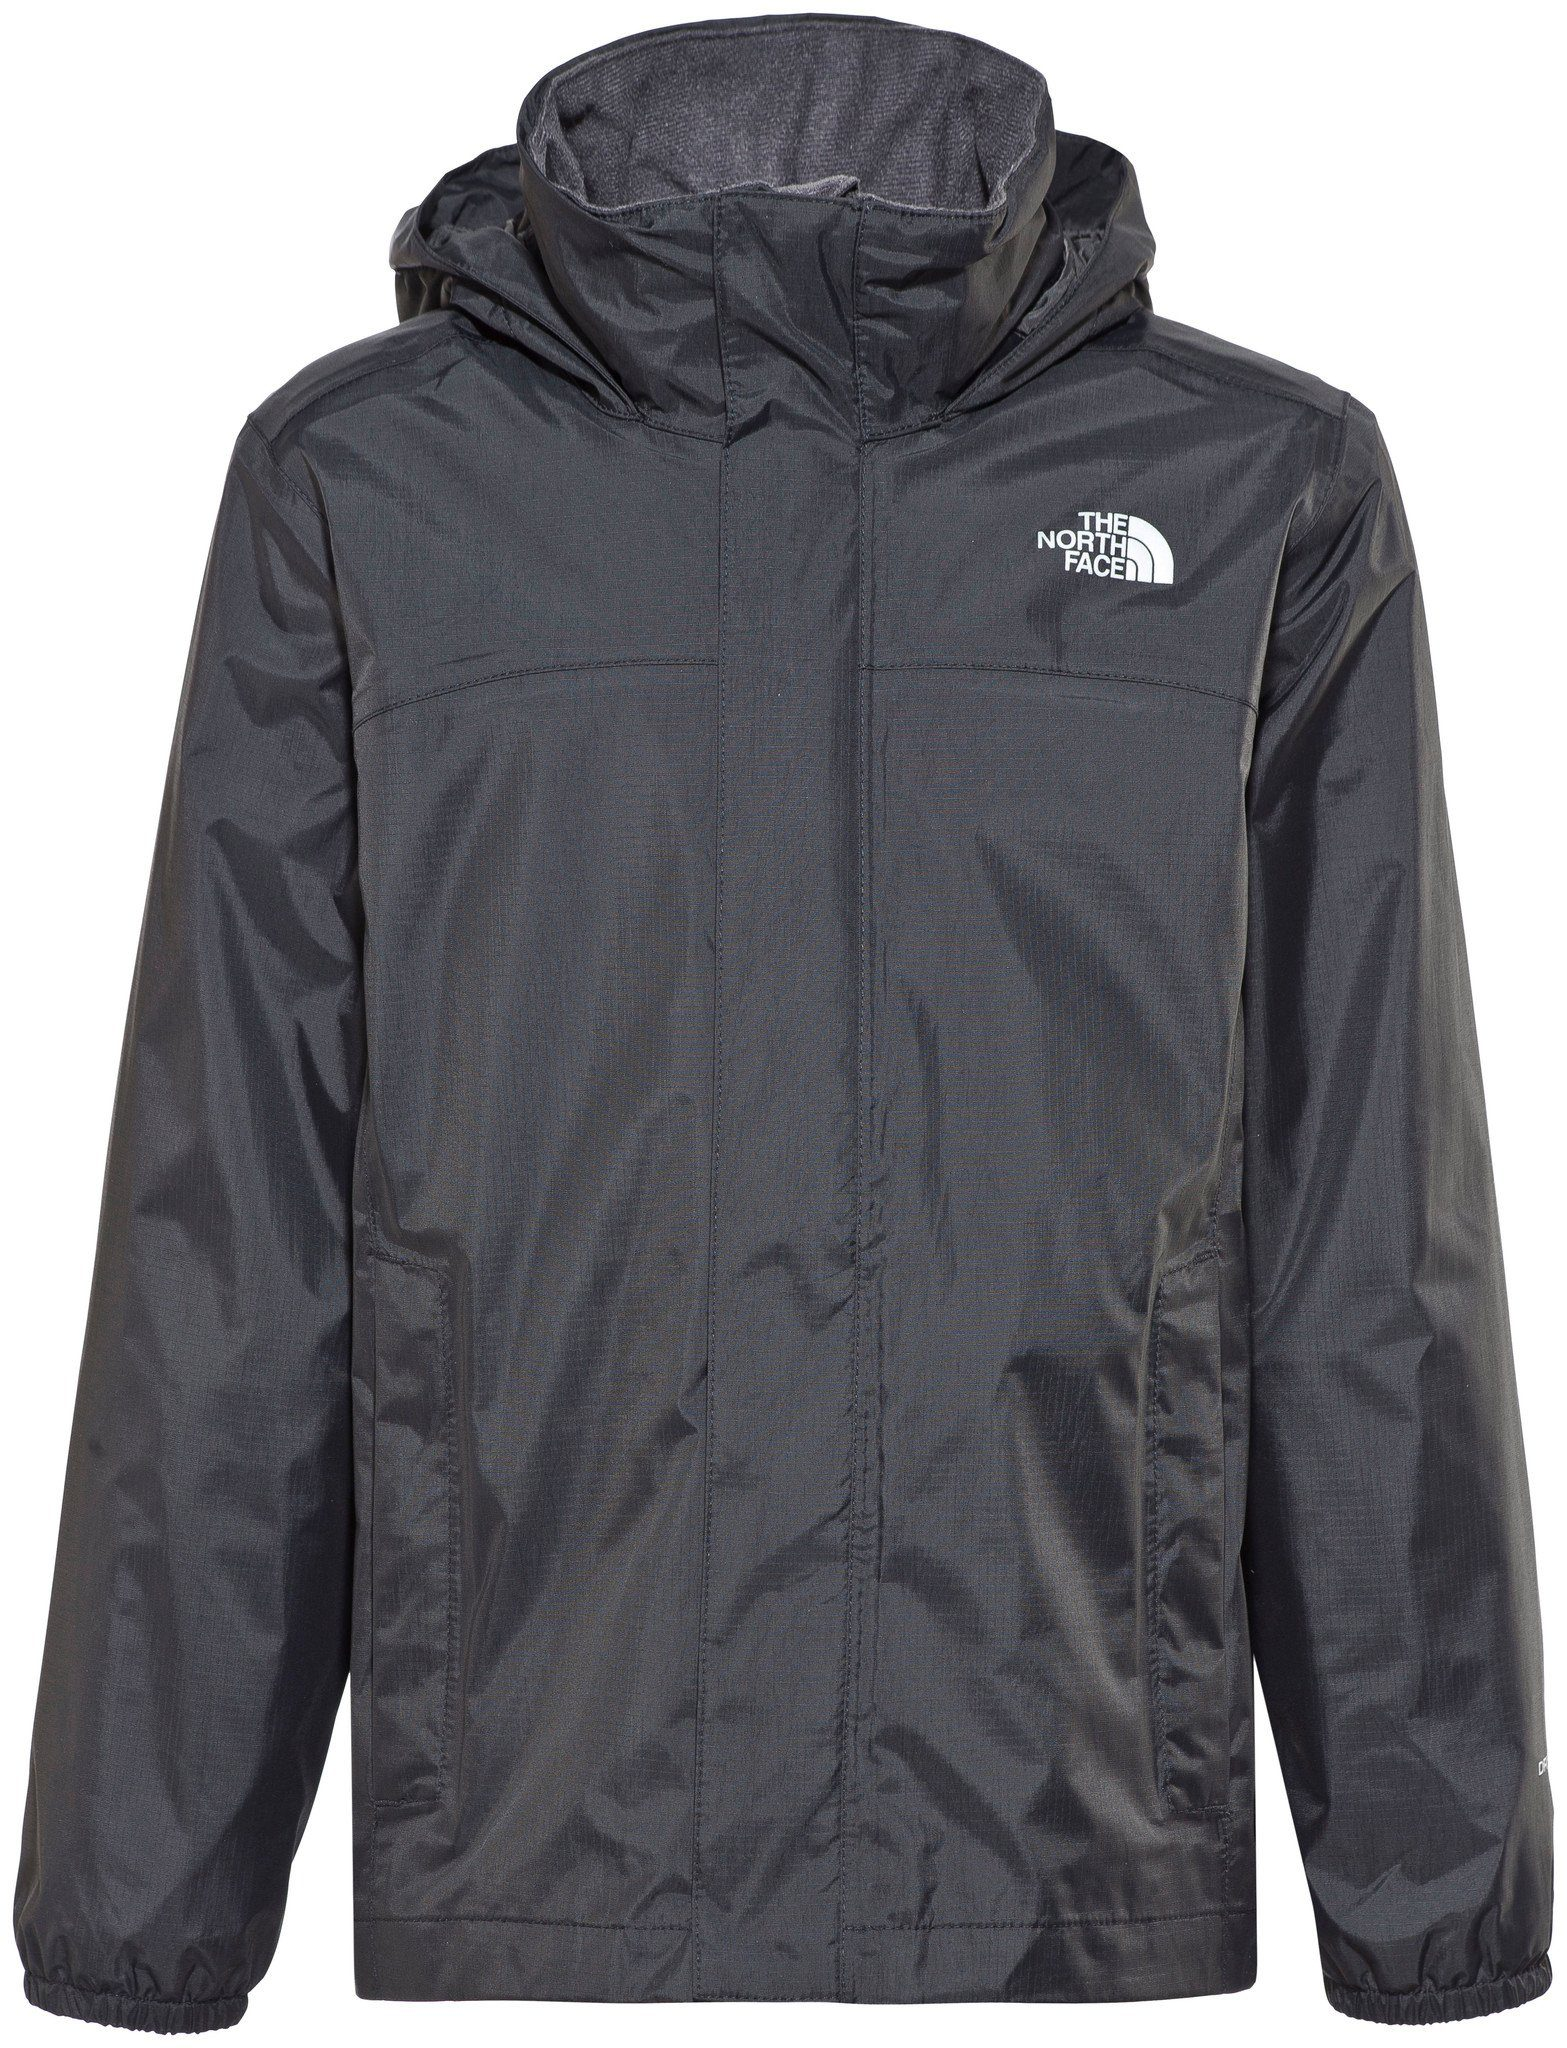 The North Face Outdoorjacke »Reflective Resolve Jacket Boys«